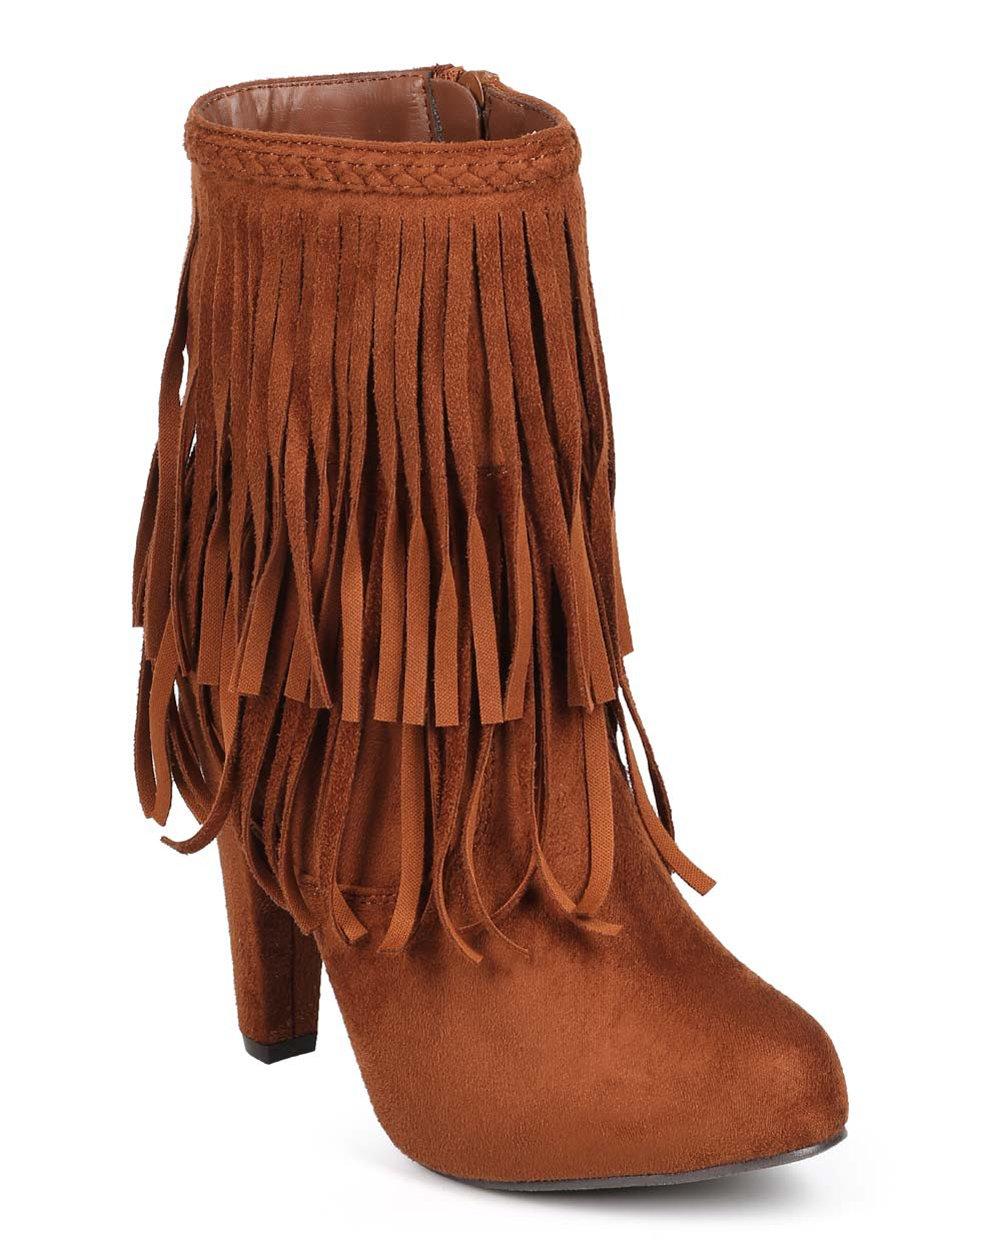 Phoebe 11 Womens Fringe 2 Layer High Heel Ankle Bootie Black B074BD9WHW 7.5 B(M) US|Tan